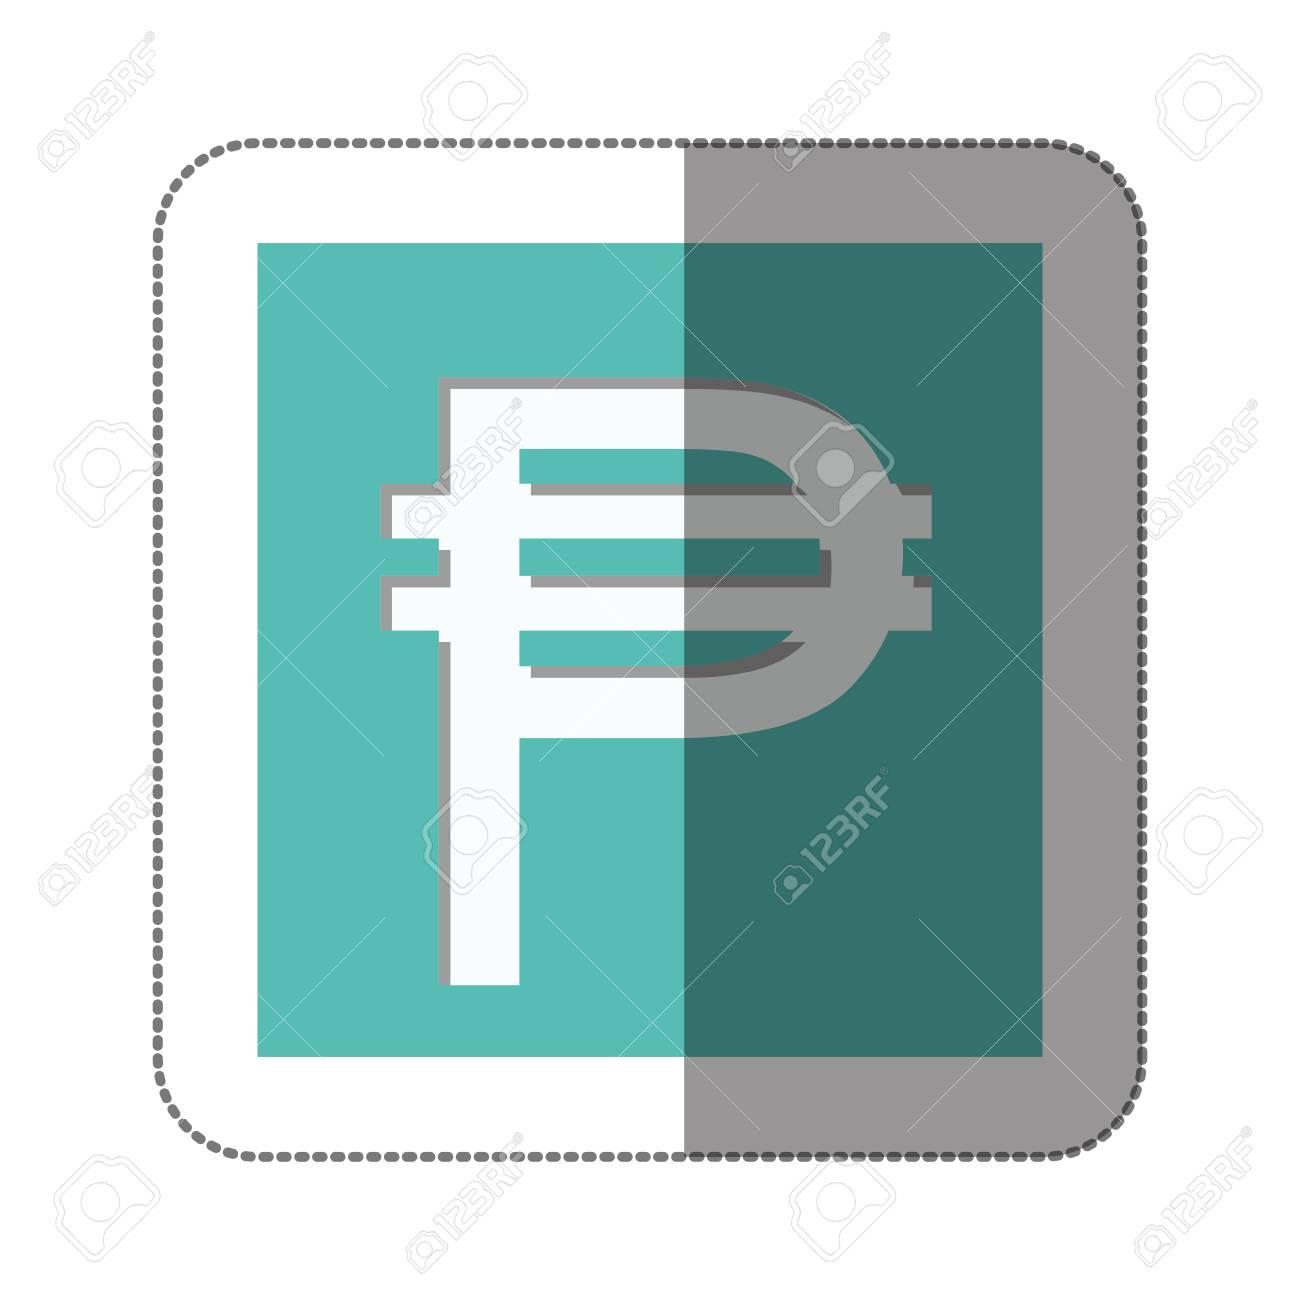 Pesos Currency Symbol Icon Image Vector Illustration Royalty Free